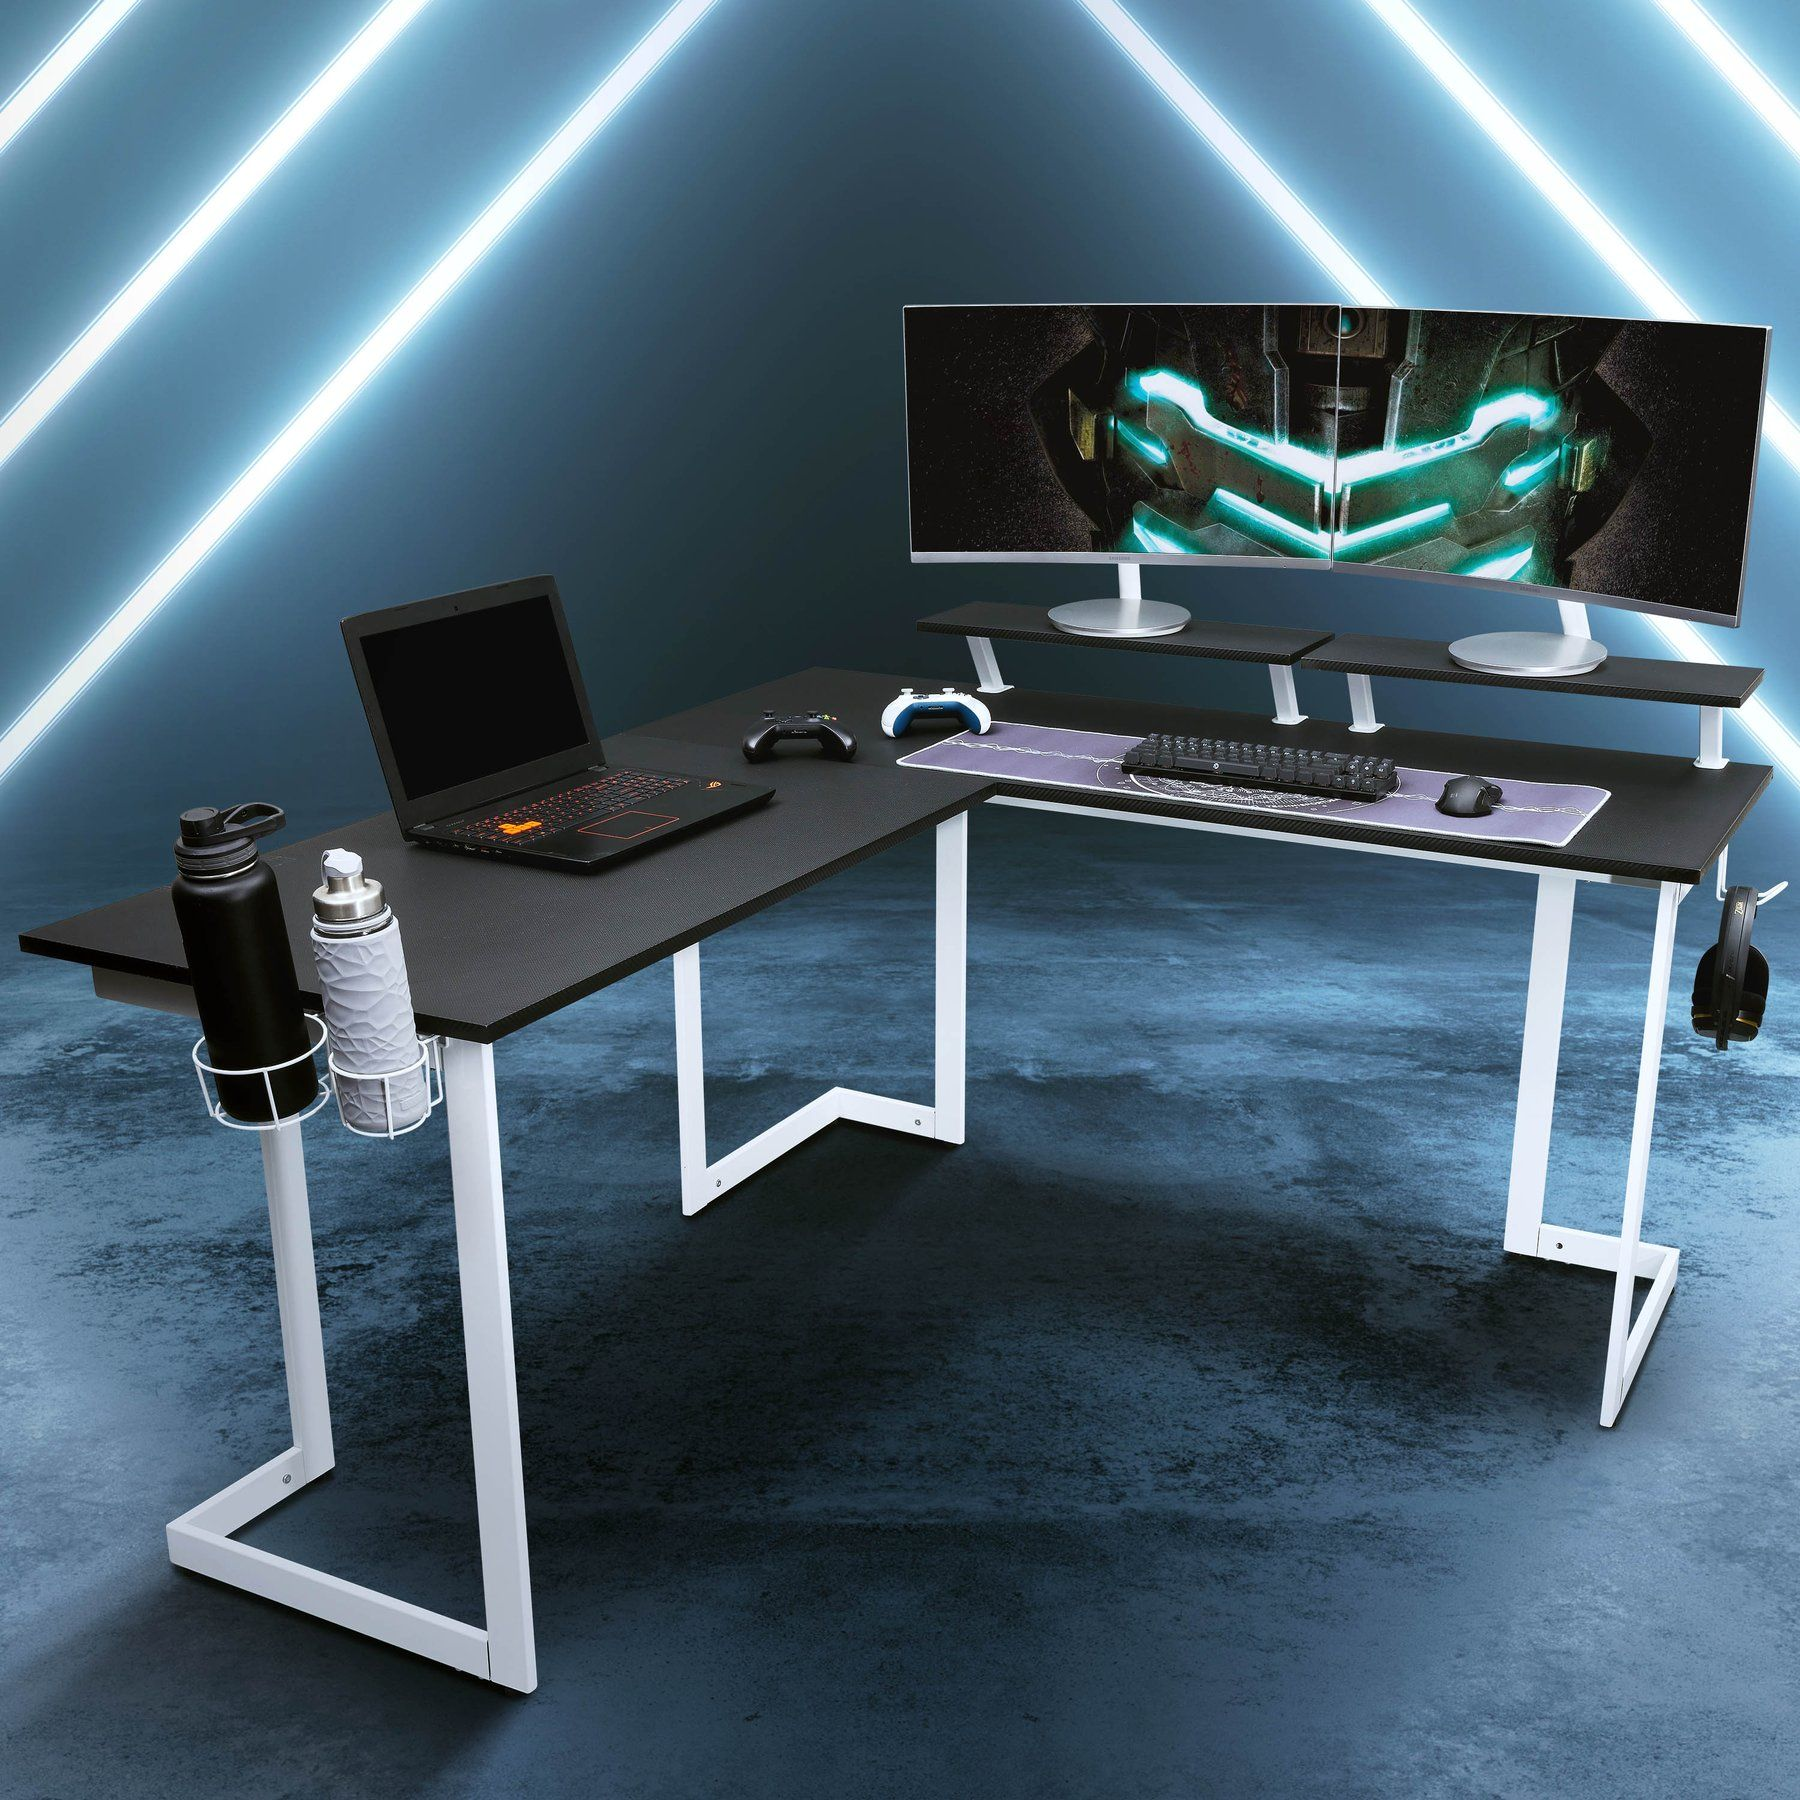 Gaming Desk Warrior in 2020 Gaming desk, Home office